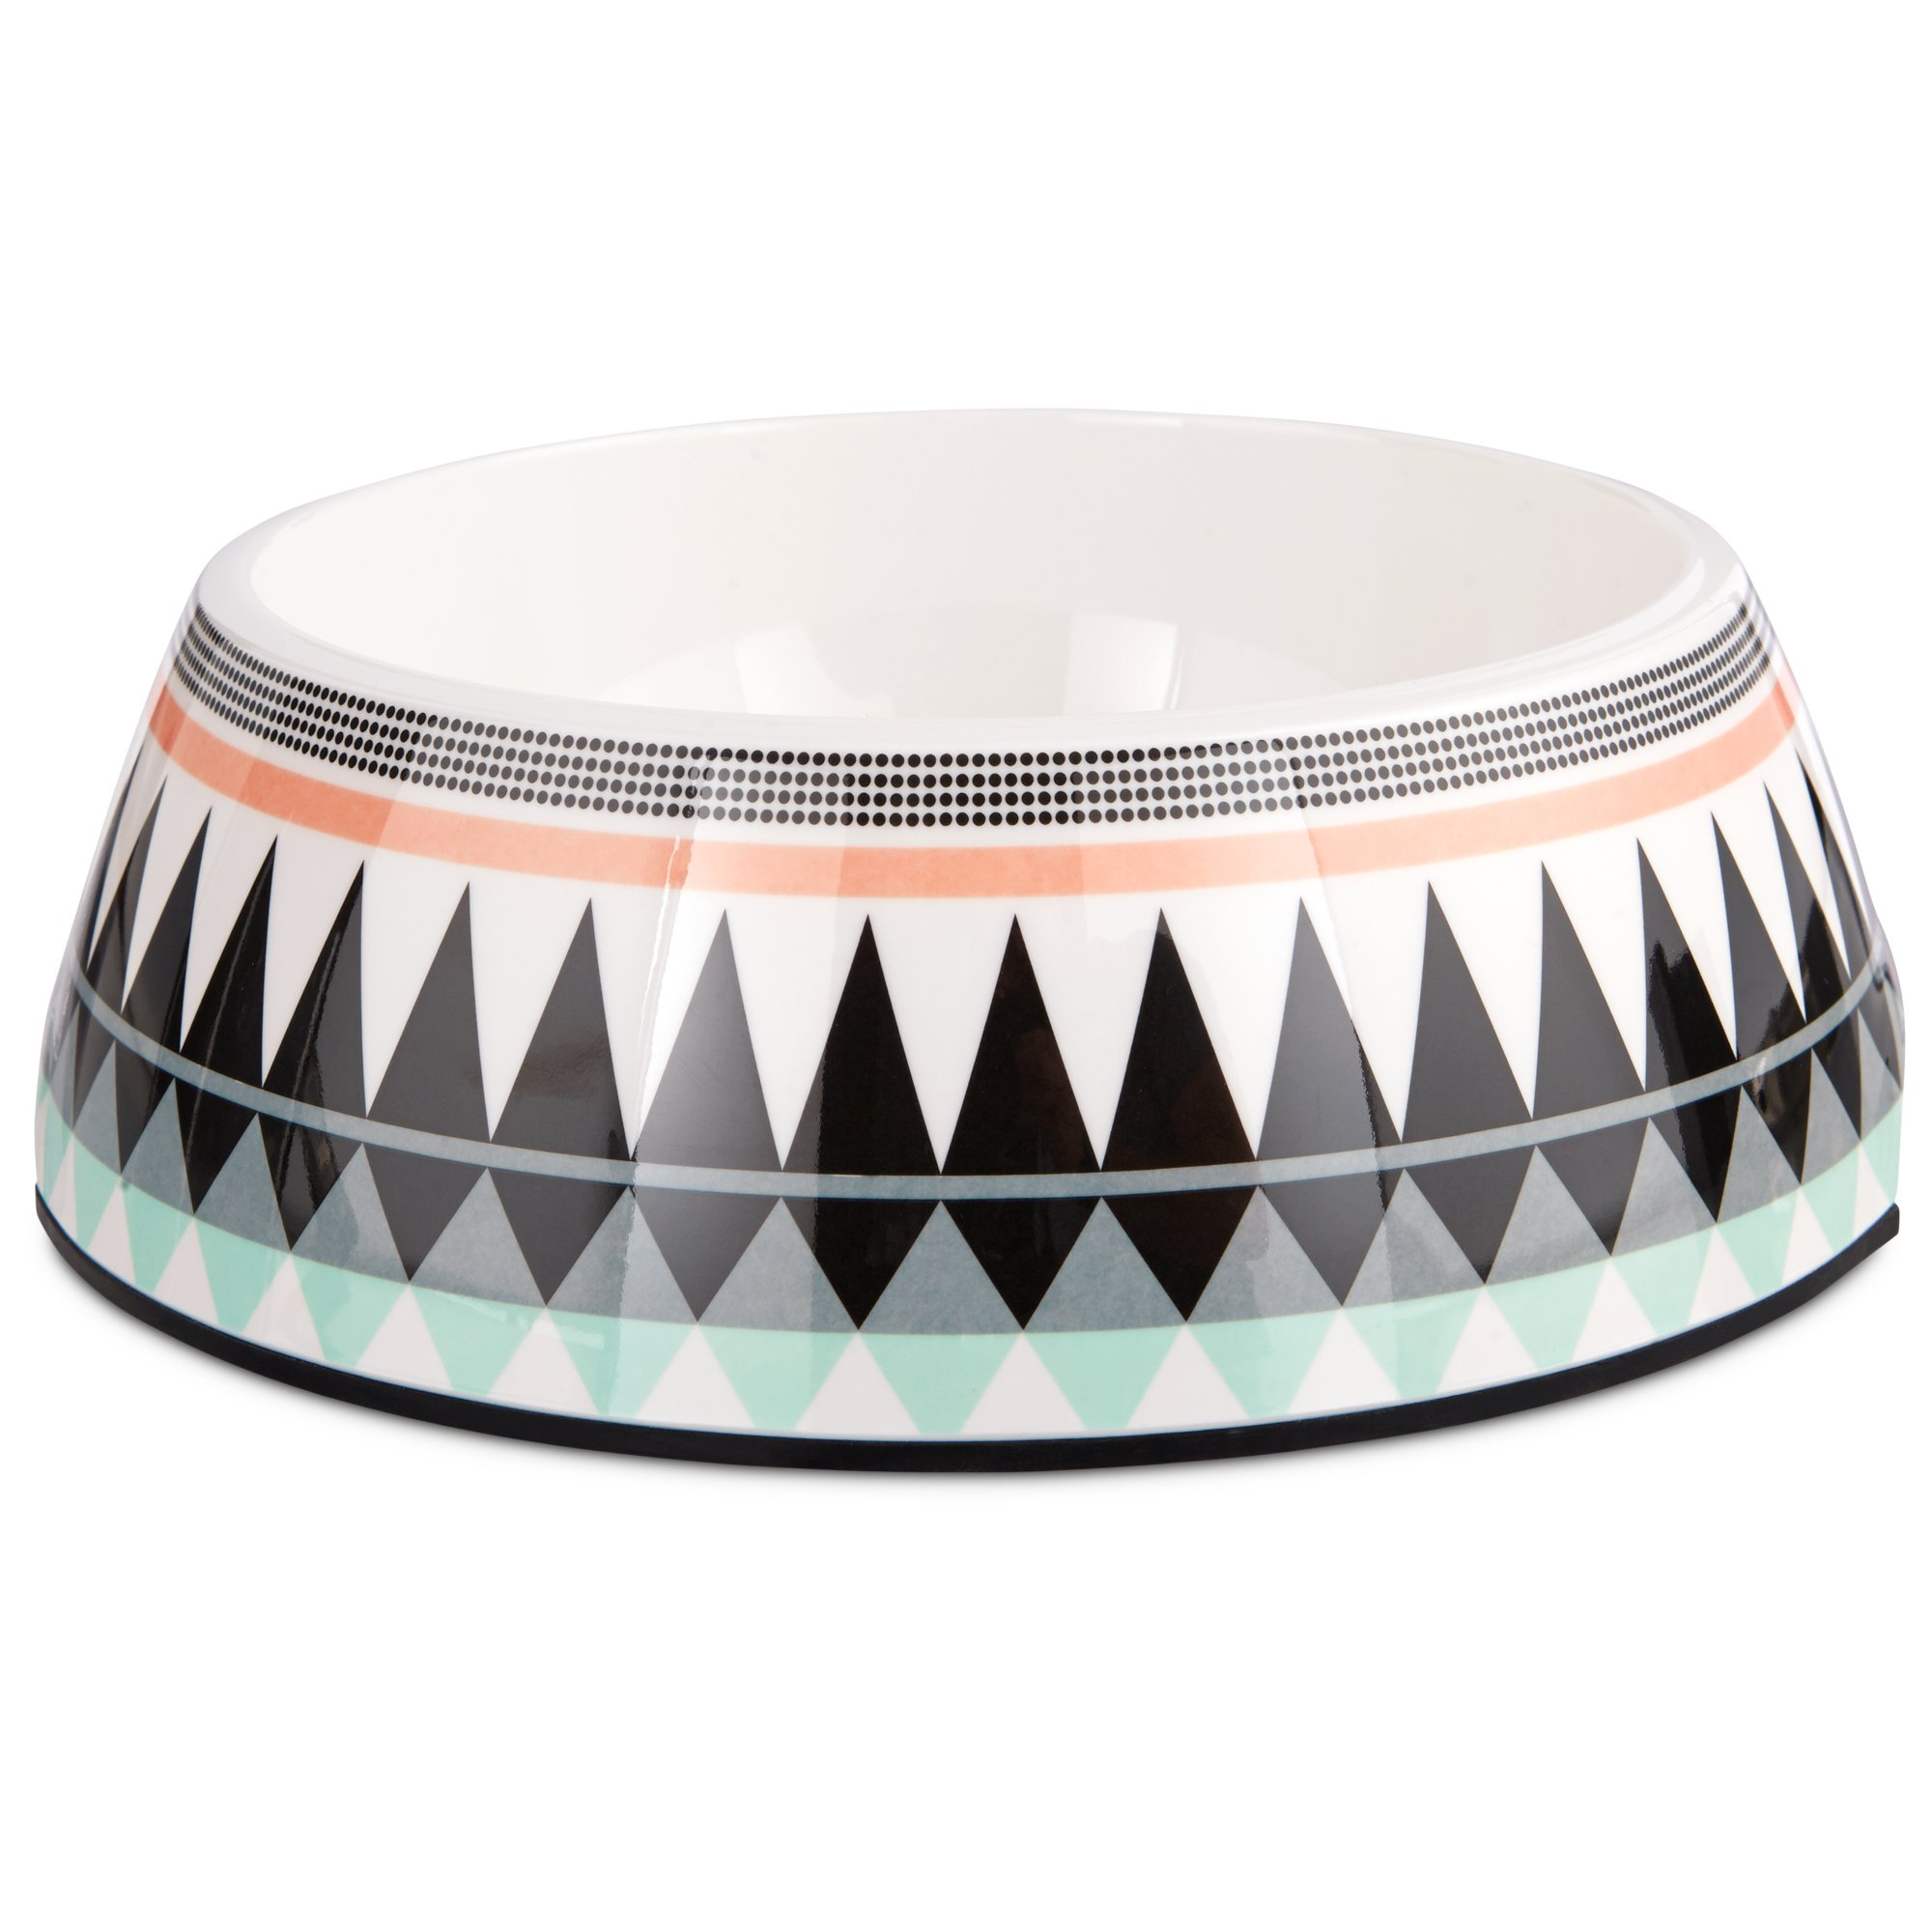 Image of Bowlmates Aztec Print Single Round Base, 3 Cup, Medium, Black / Multi-Color